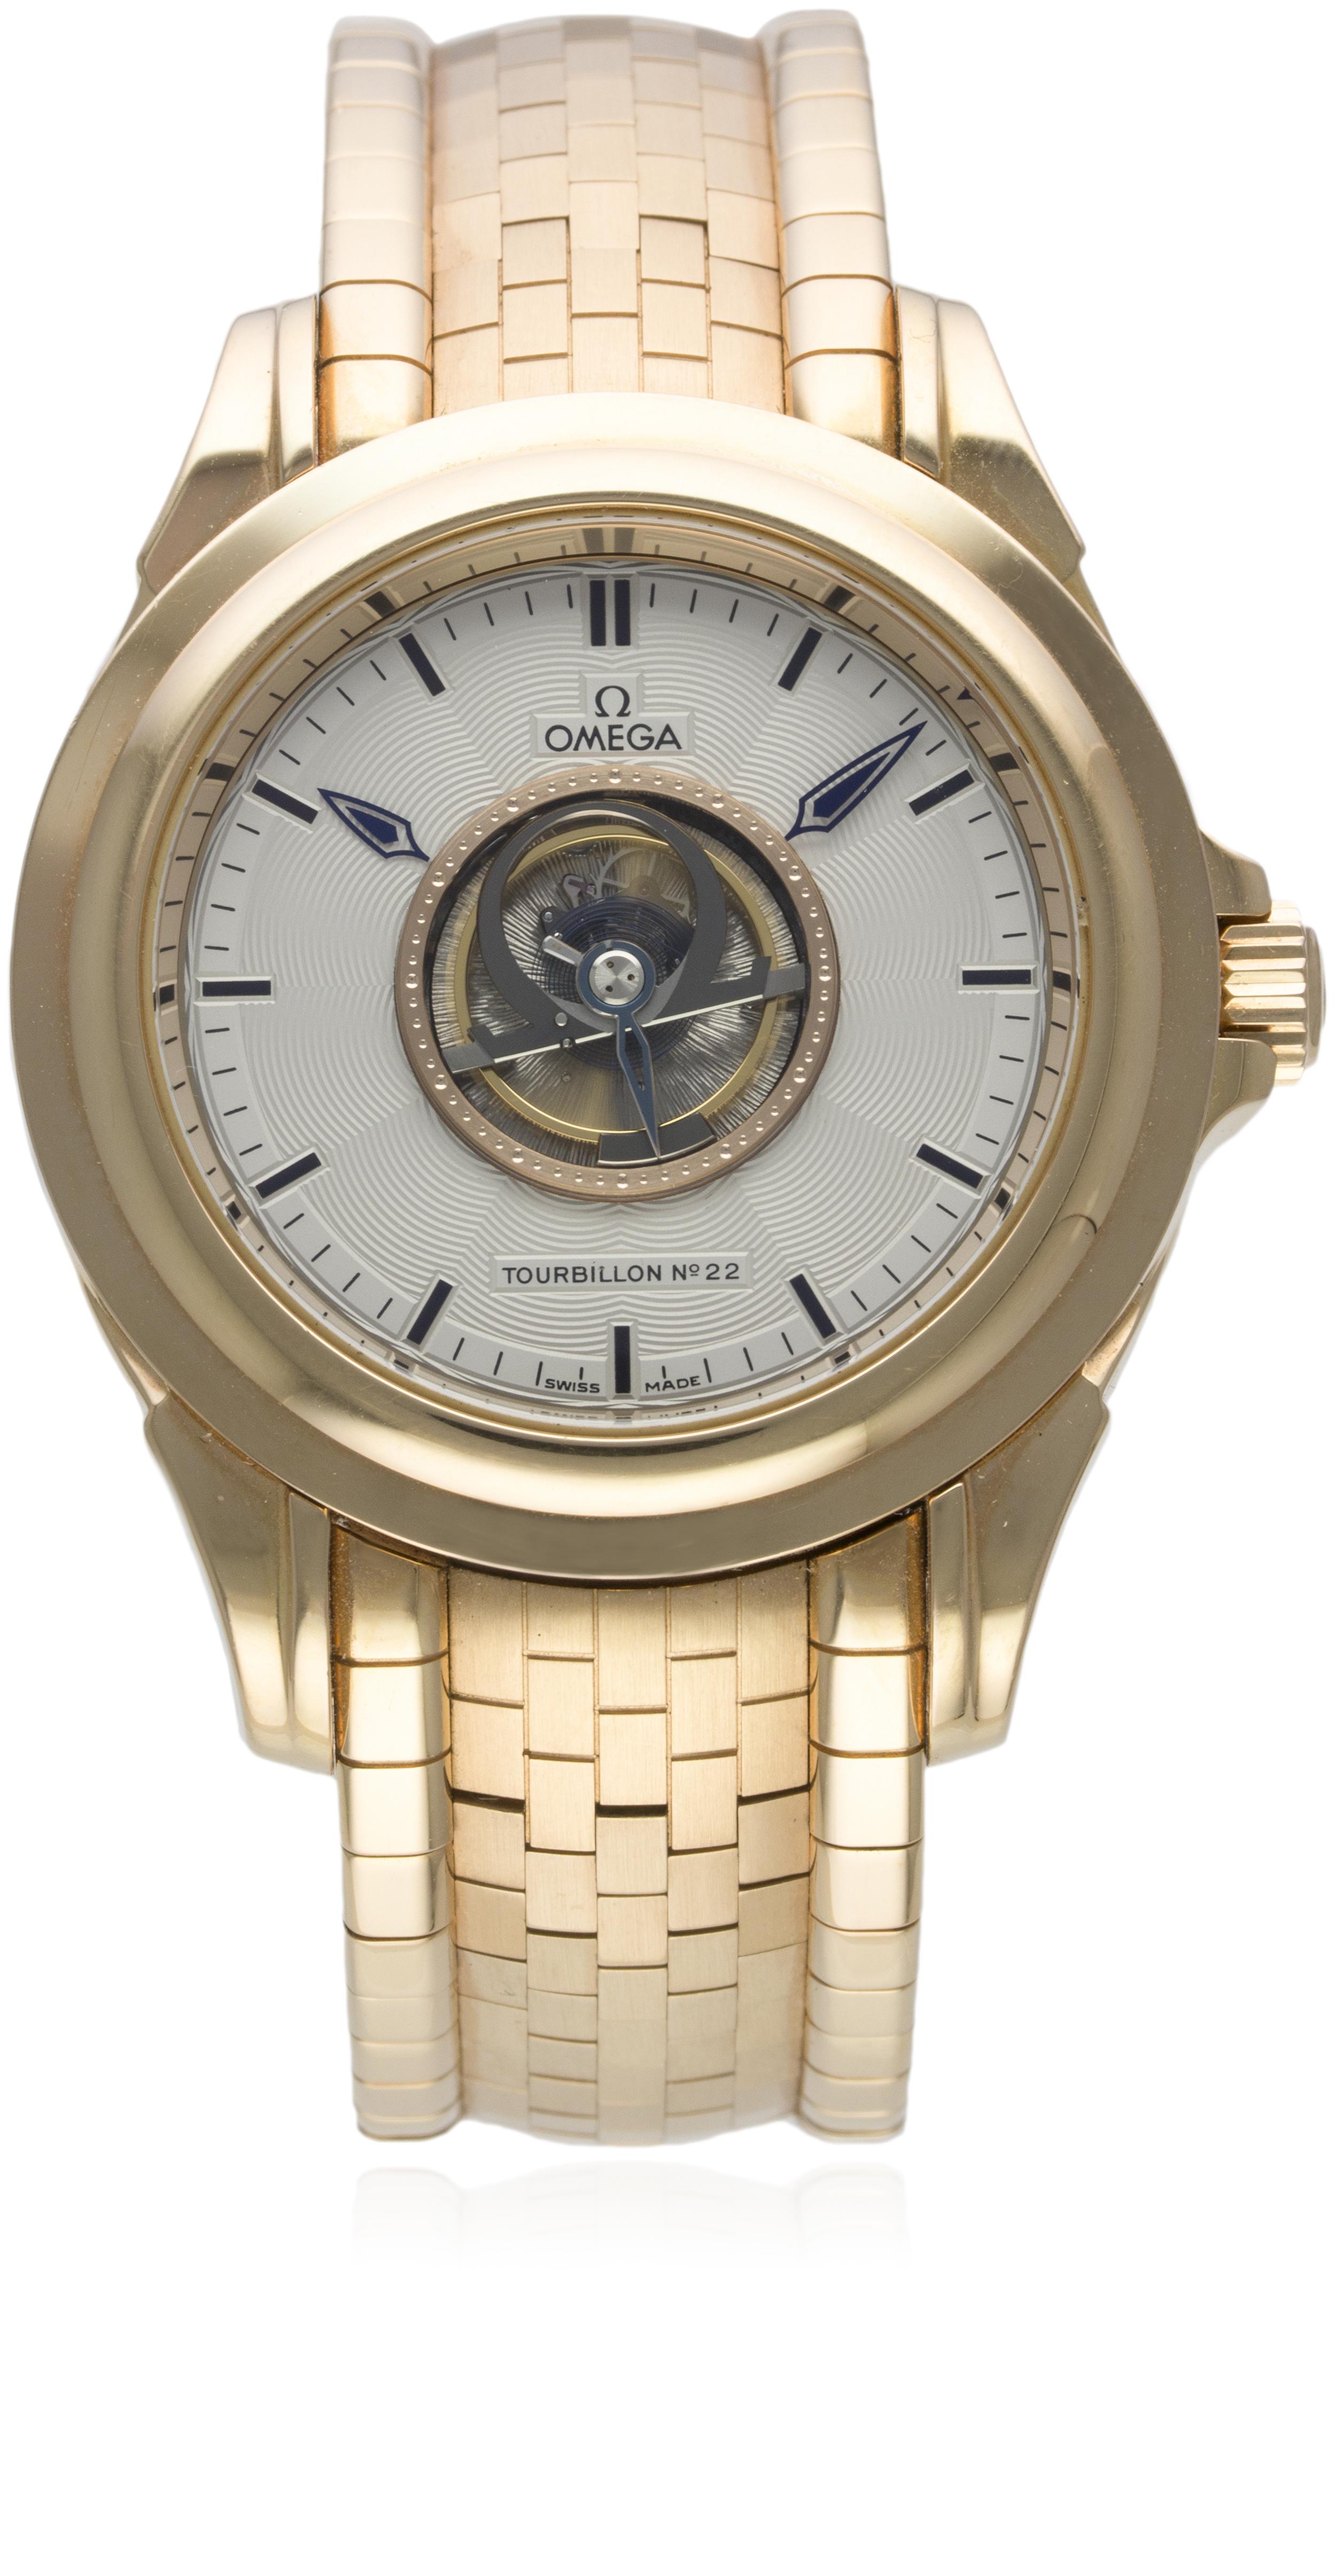 Lot 187 - Omega Central Tourbillon Chronometer